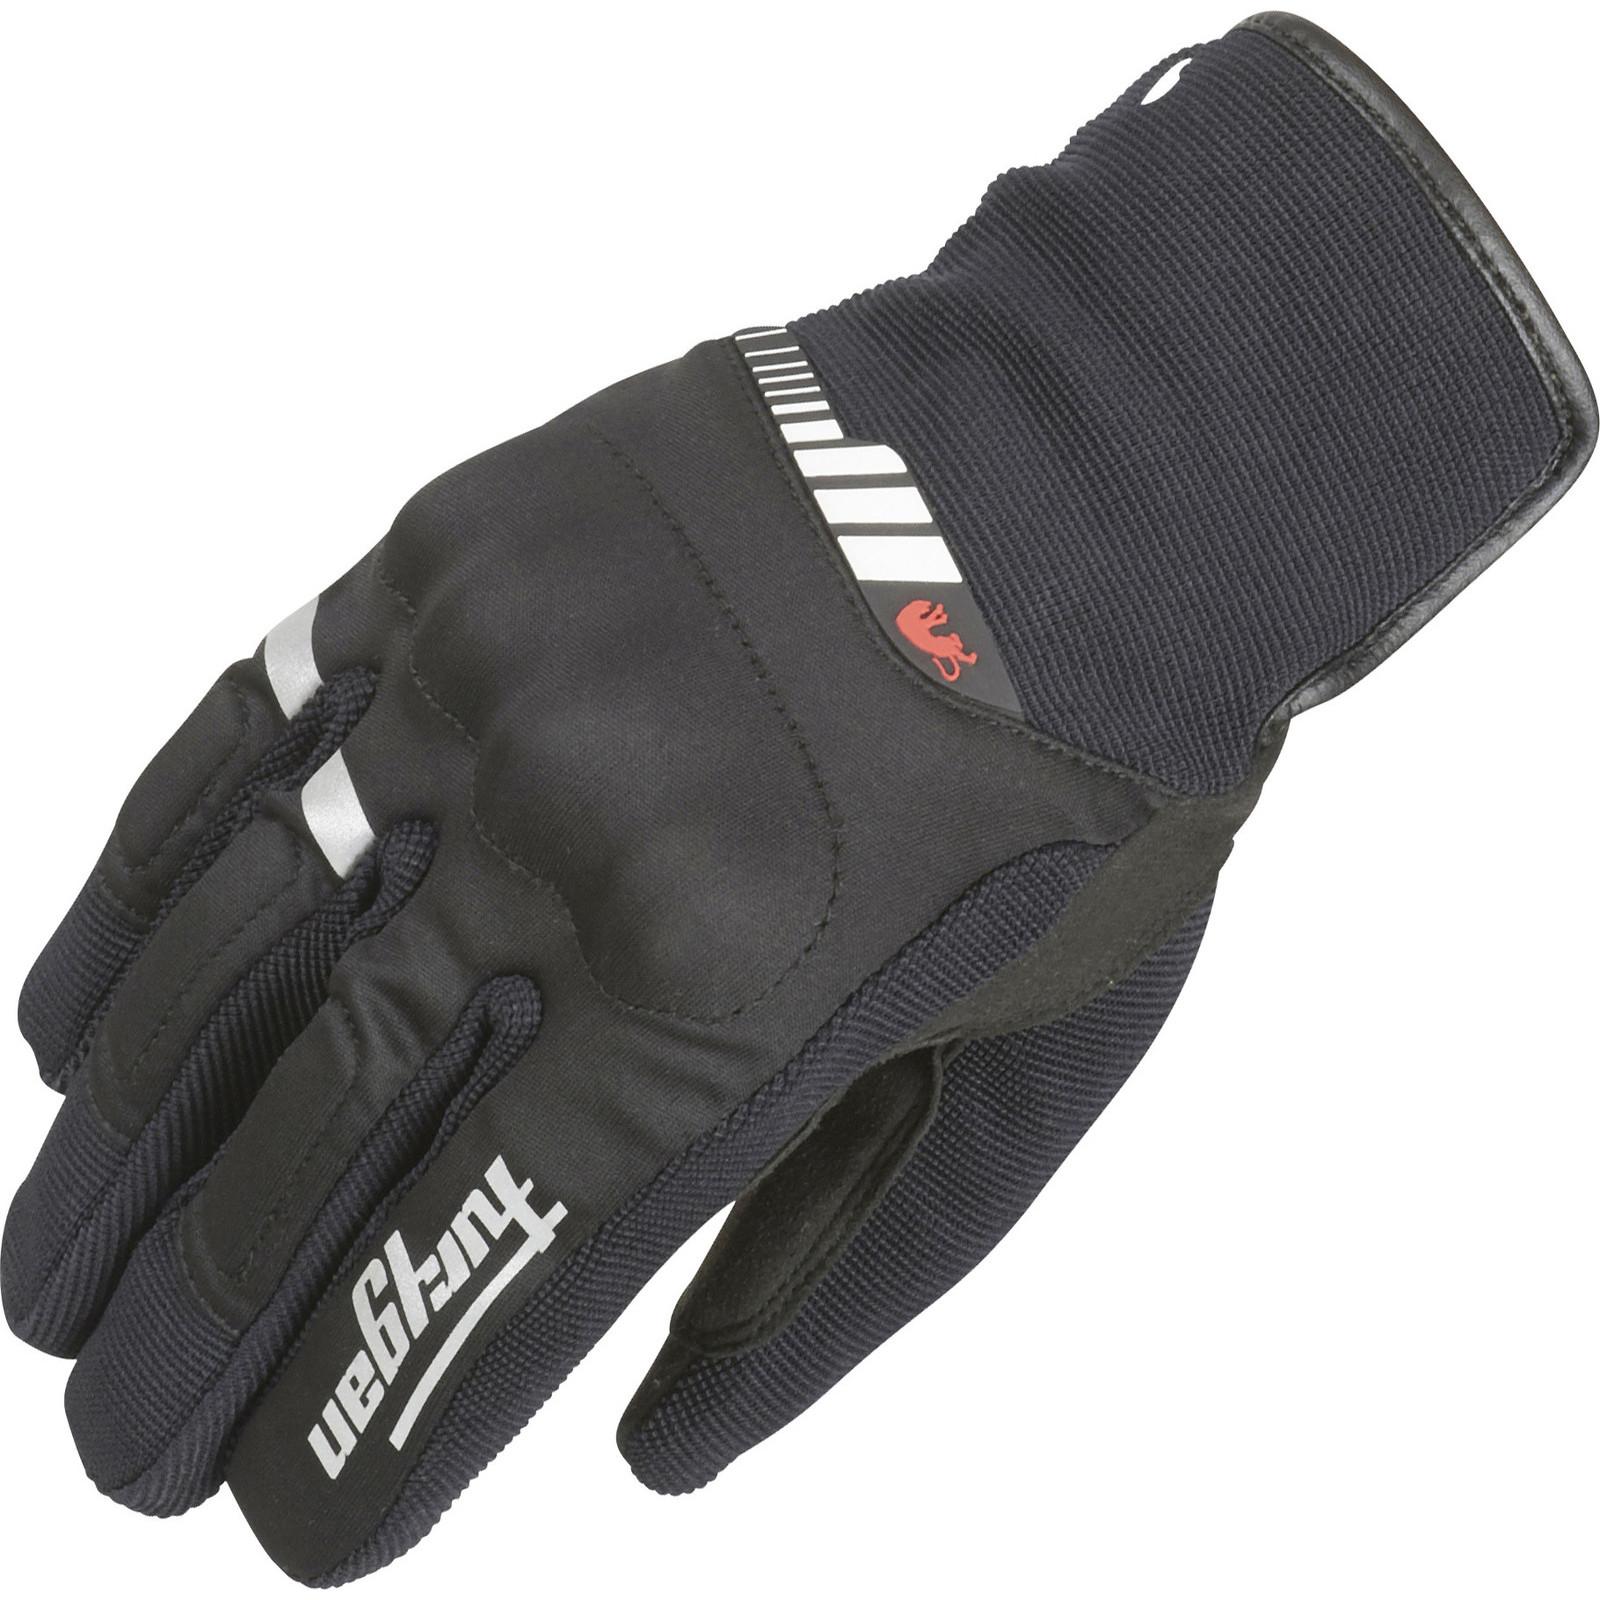 Furygan-Jet-All-Season-Motorcycle-Gloves-Waterproof-Textile-Biker-Short-Glove